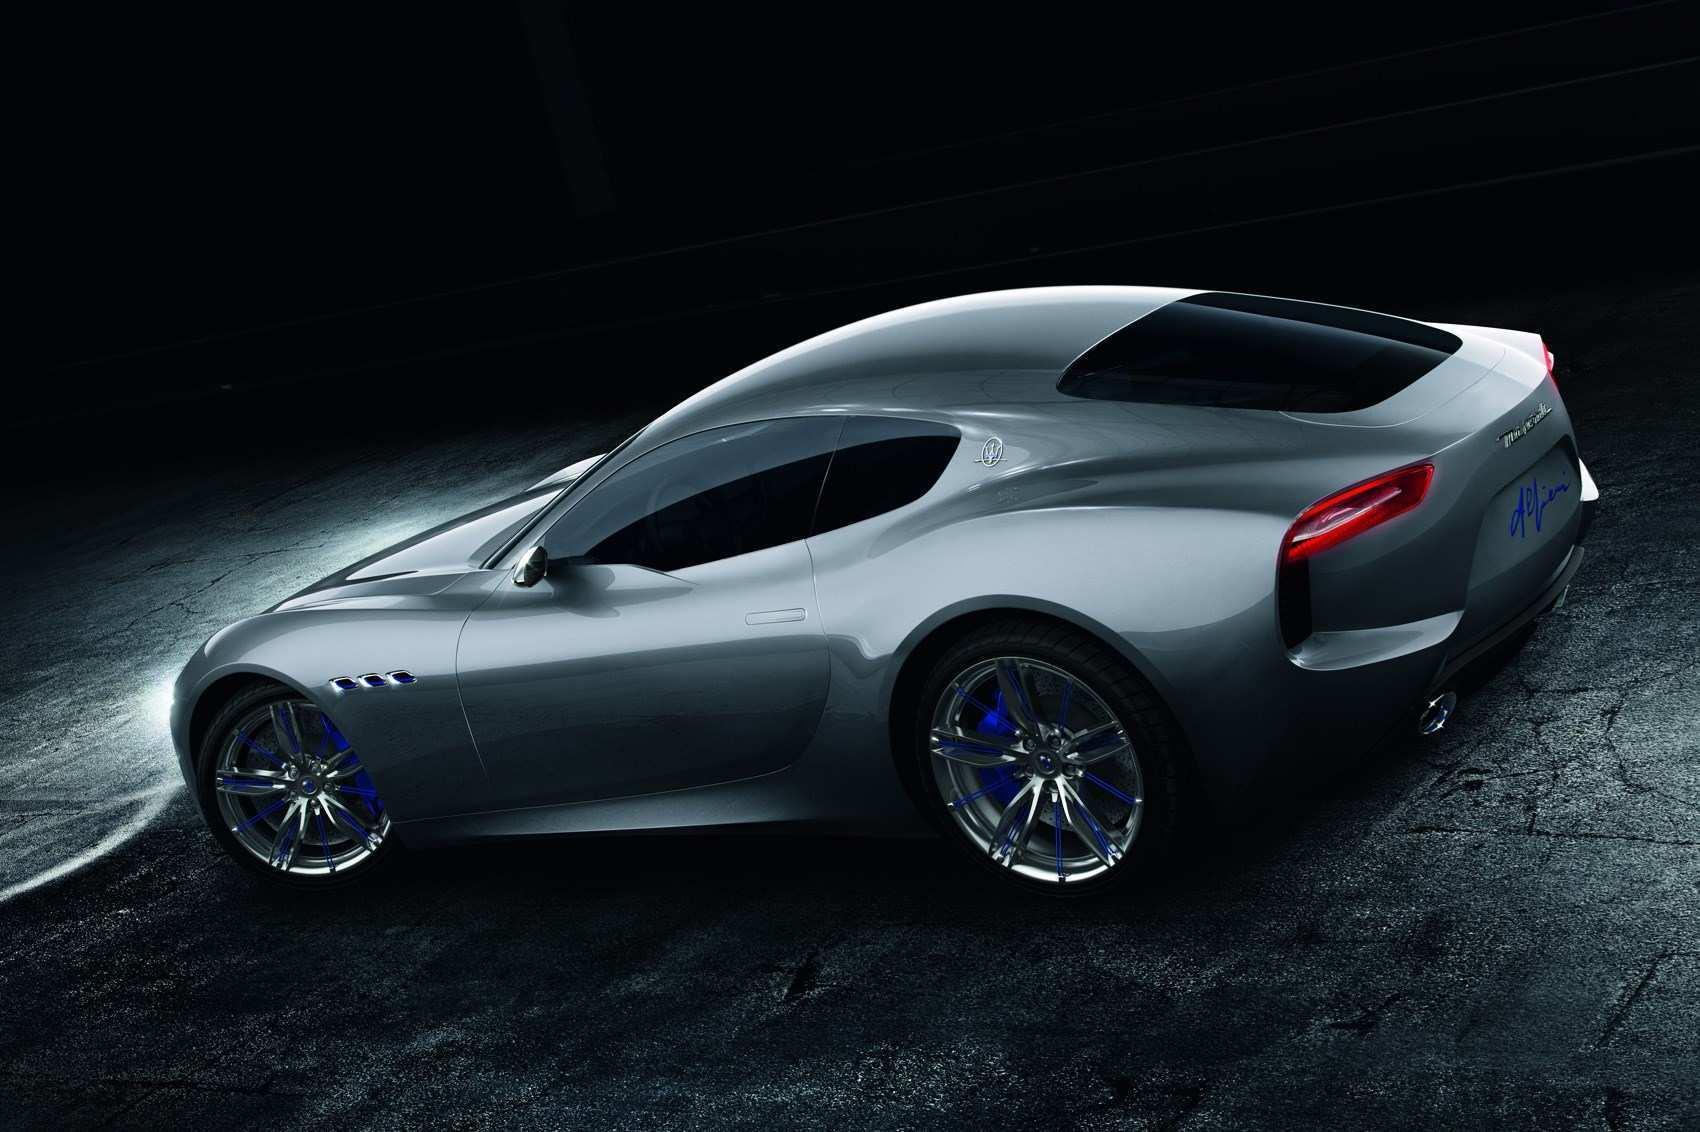 40 New Maserati Gt 2020 Interior with Maserati Gt 2020